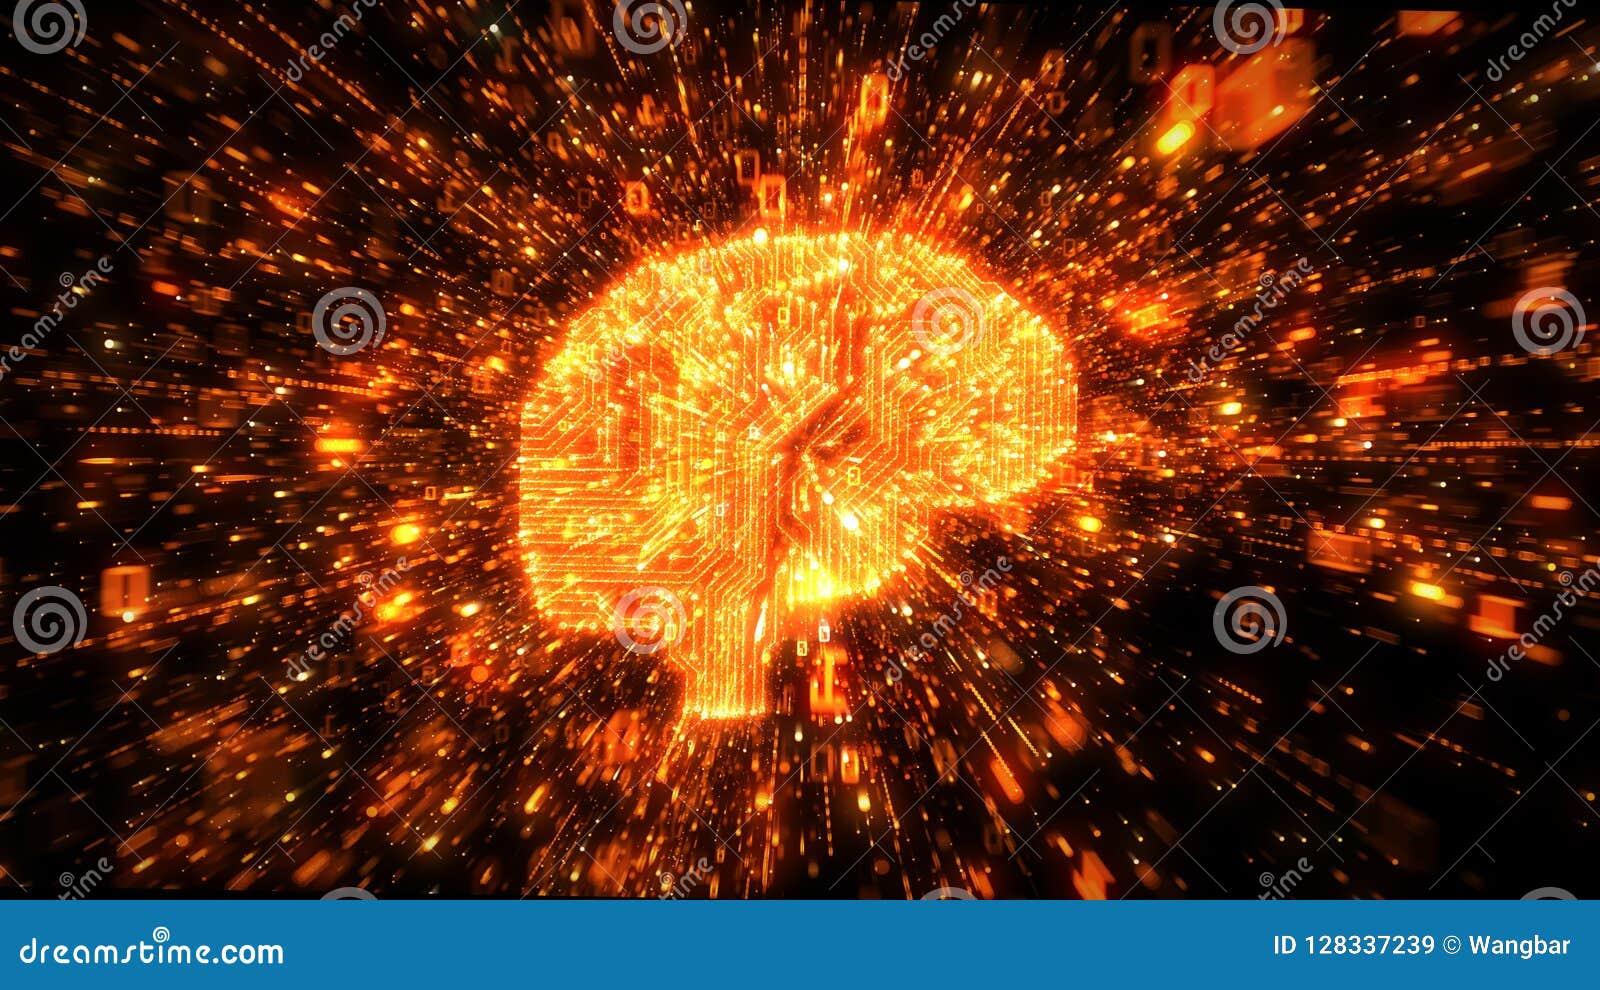 Explosion of binary data around orange brain illustrated as digital circuitry